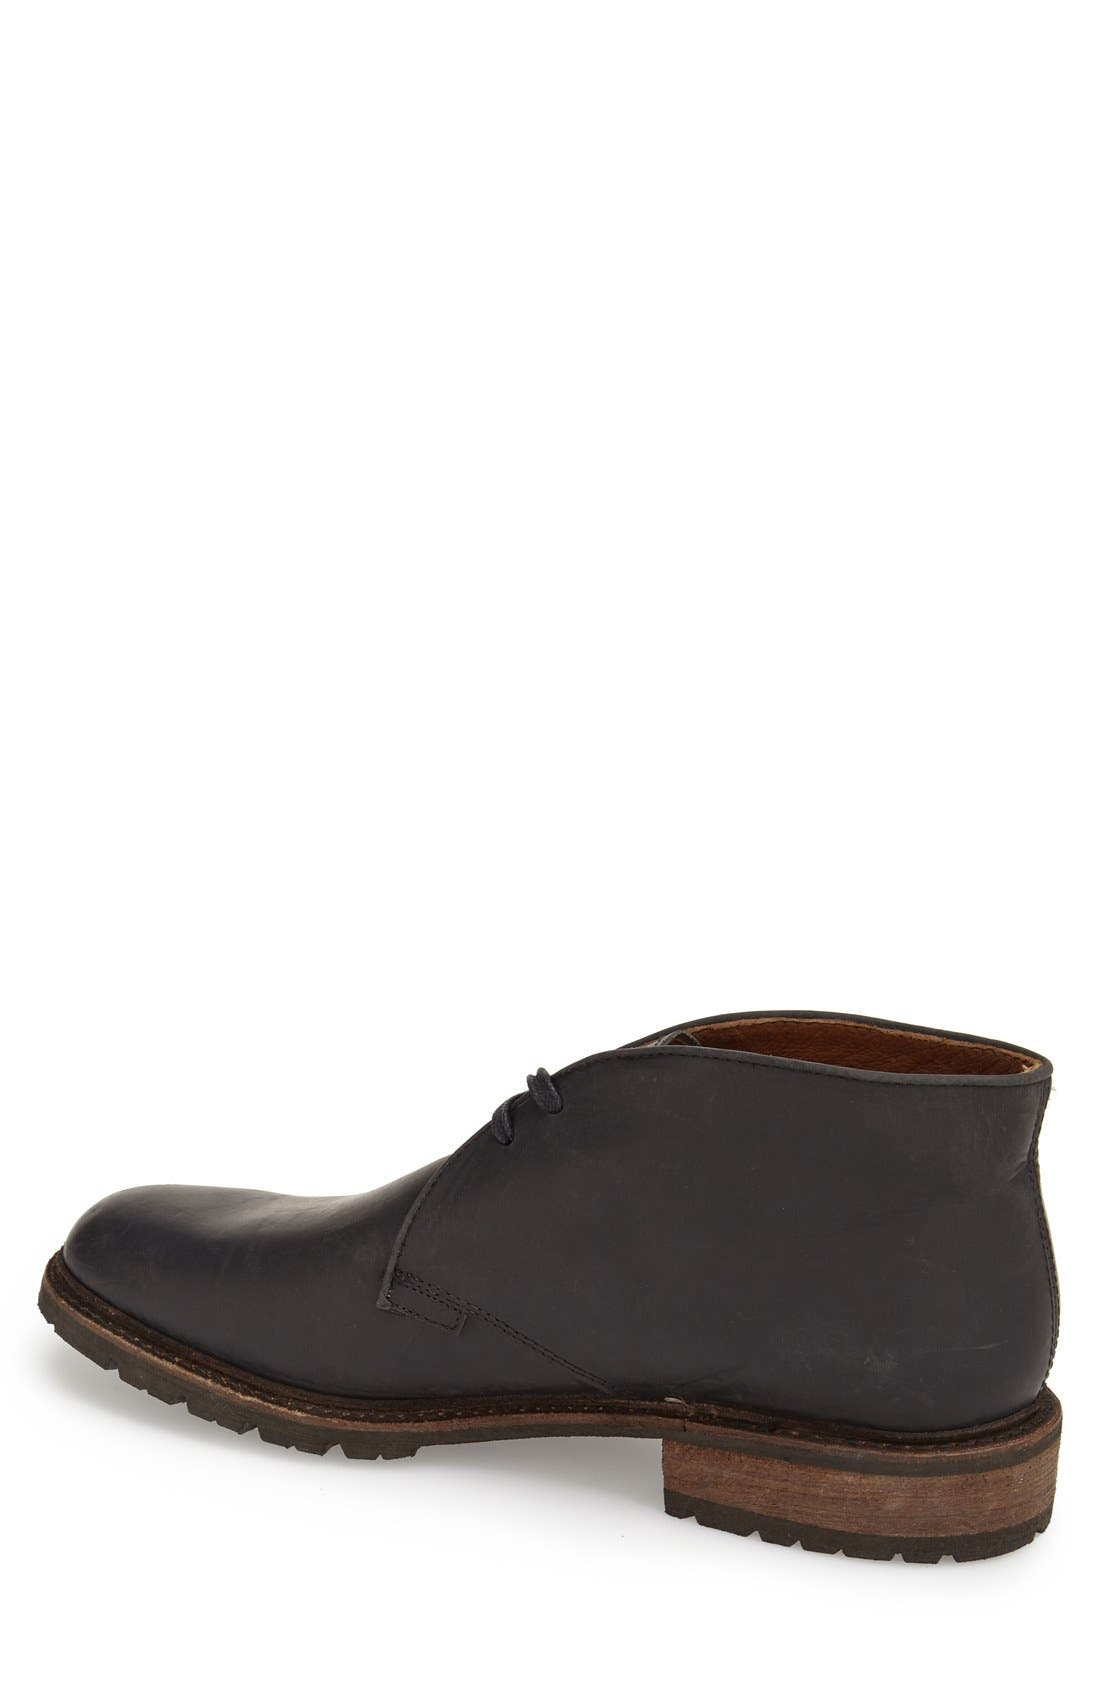 Alternate Image 2  - Frye 'James' Lug Sole Chukka Boot (Men)